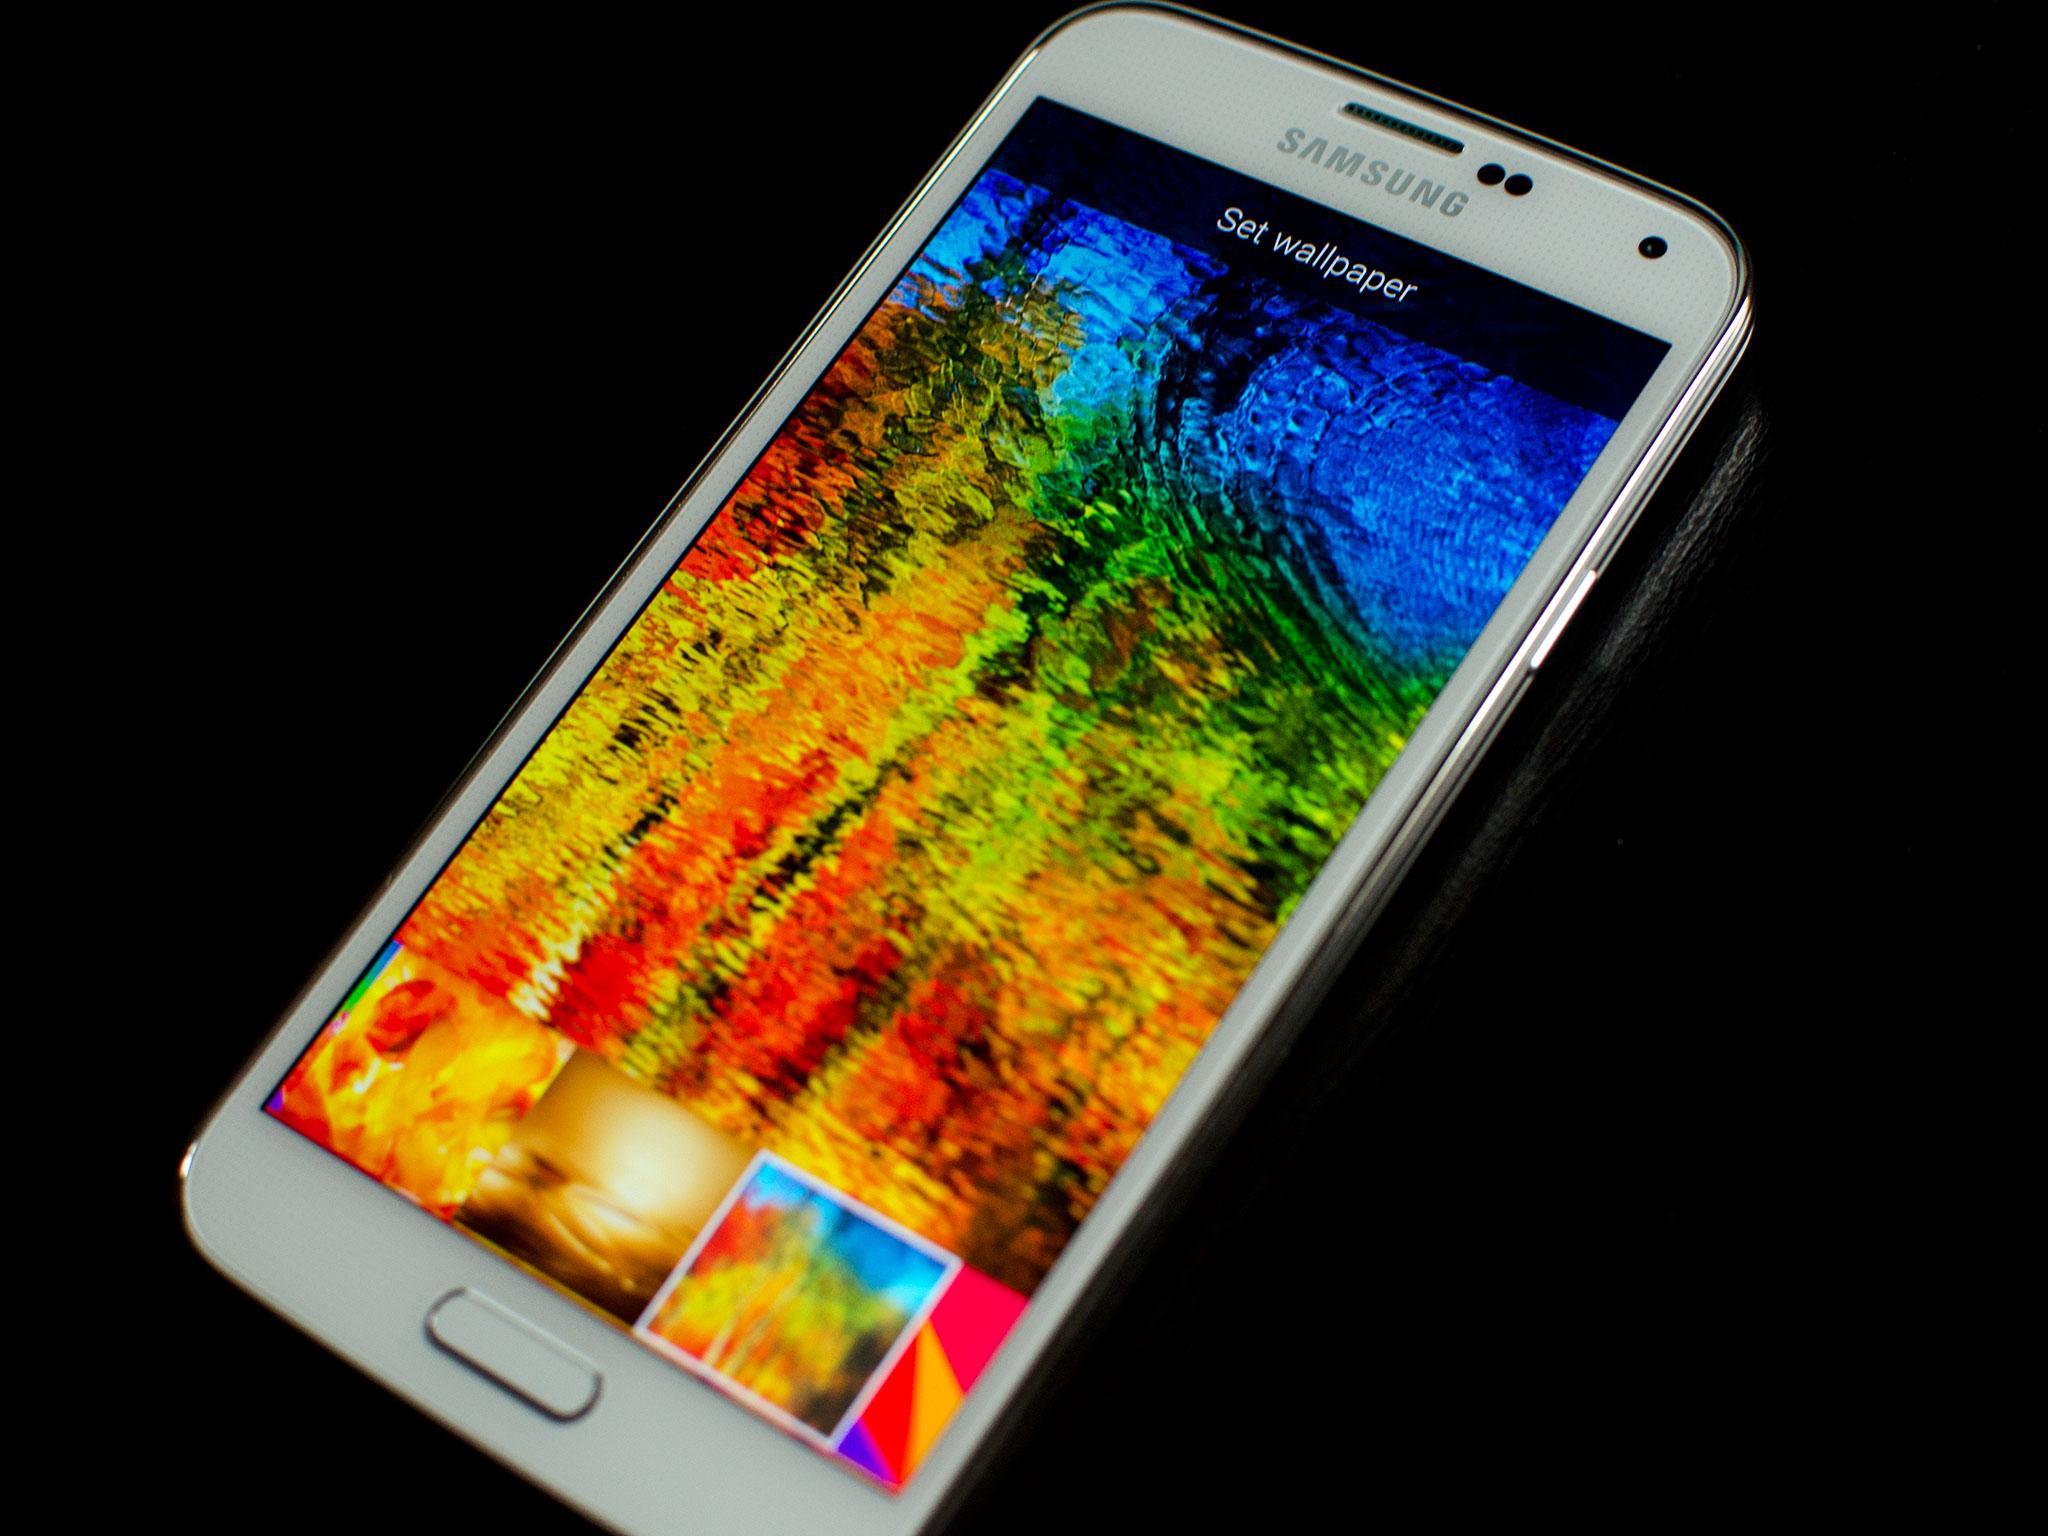 samsung galaxy s5 manual download